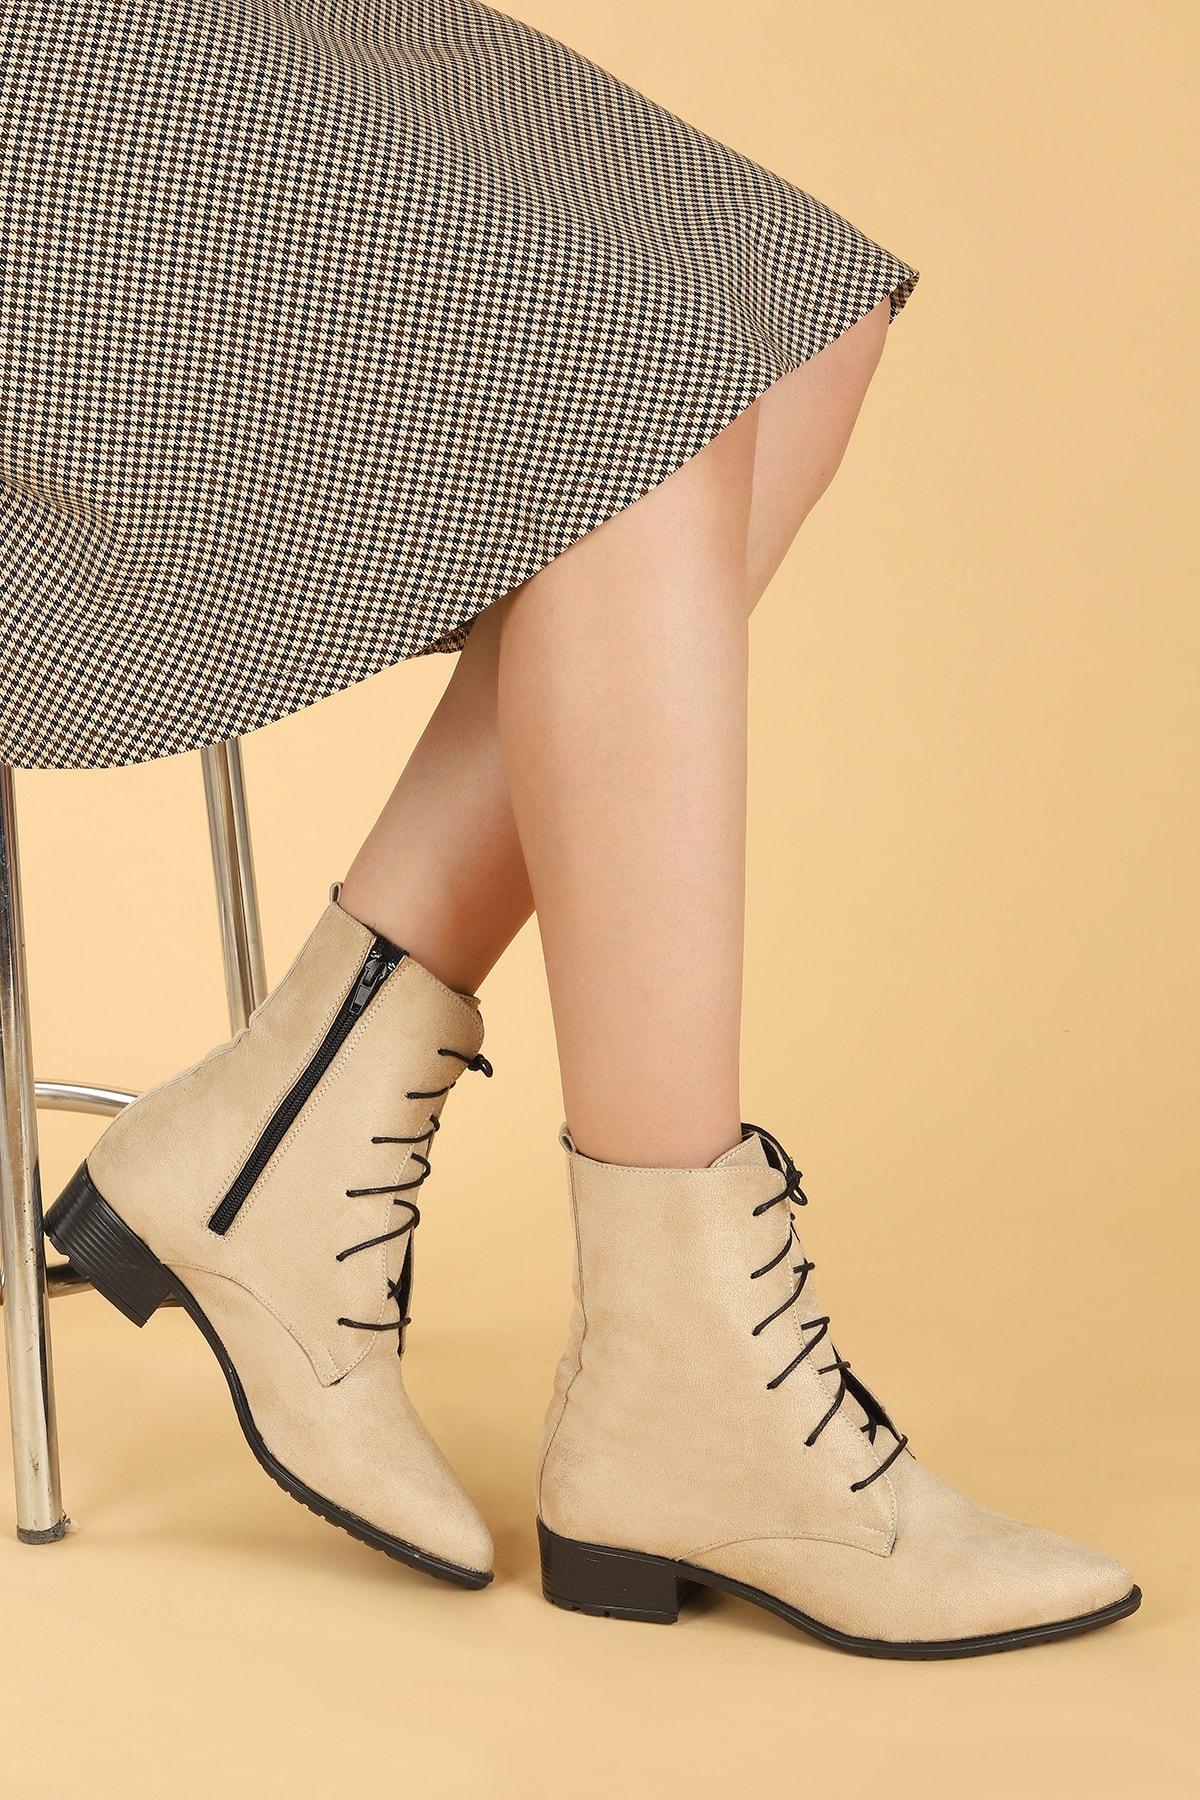 Ayakland 007-01 Süet Bağcıklı Termo Taban Bayan Bot Ayakkabı 1